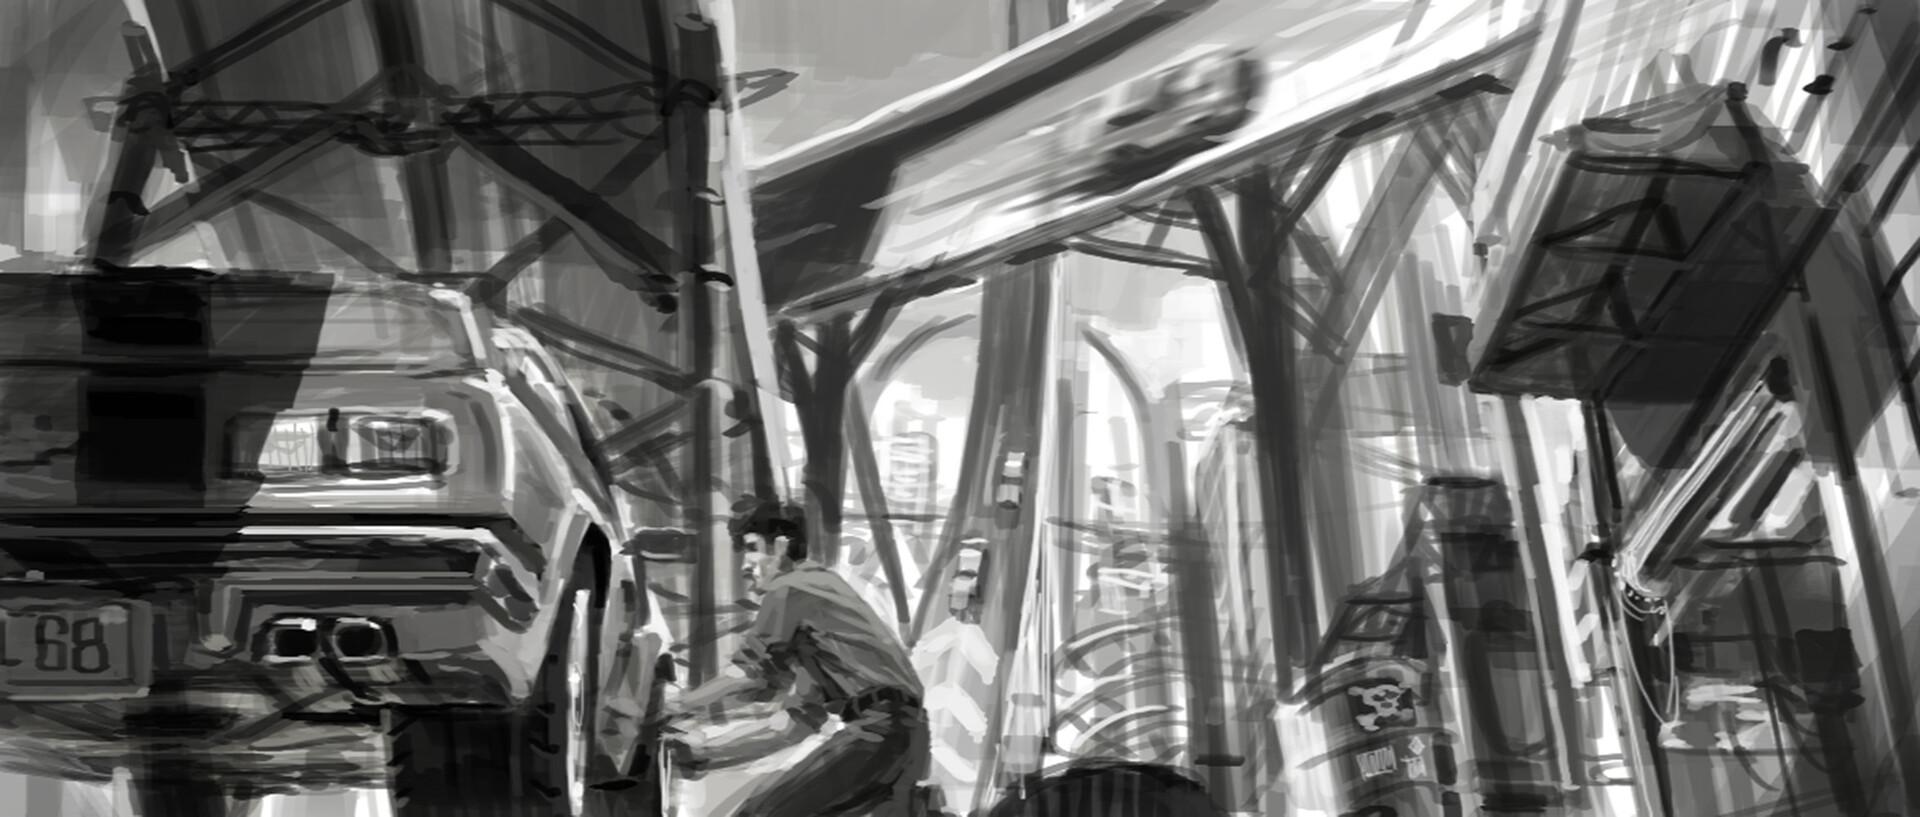 Phil saunders motorcitysketch3